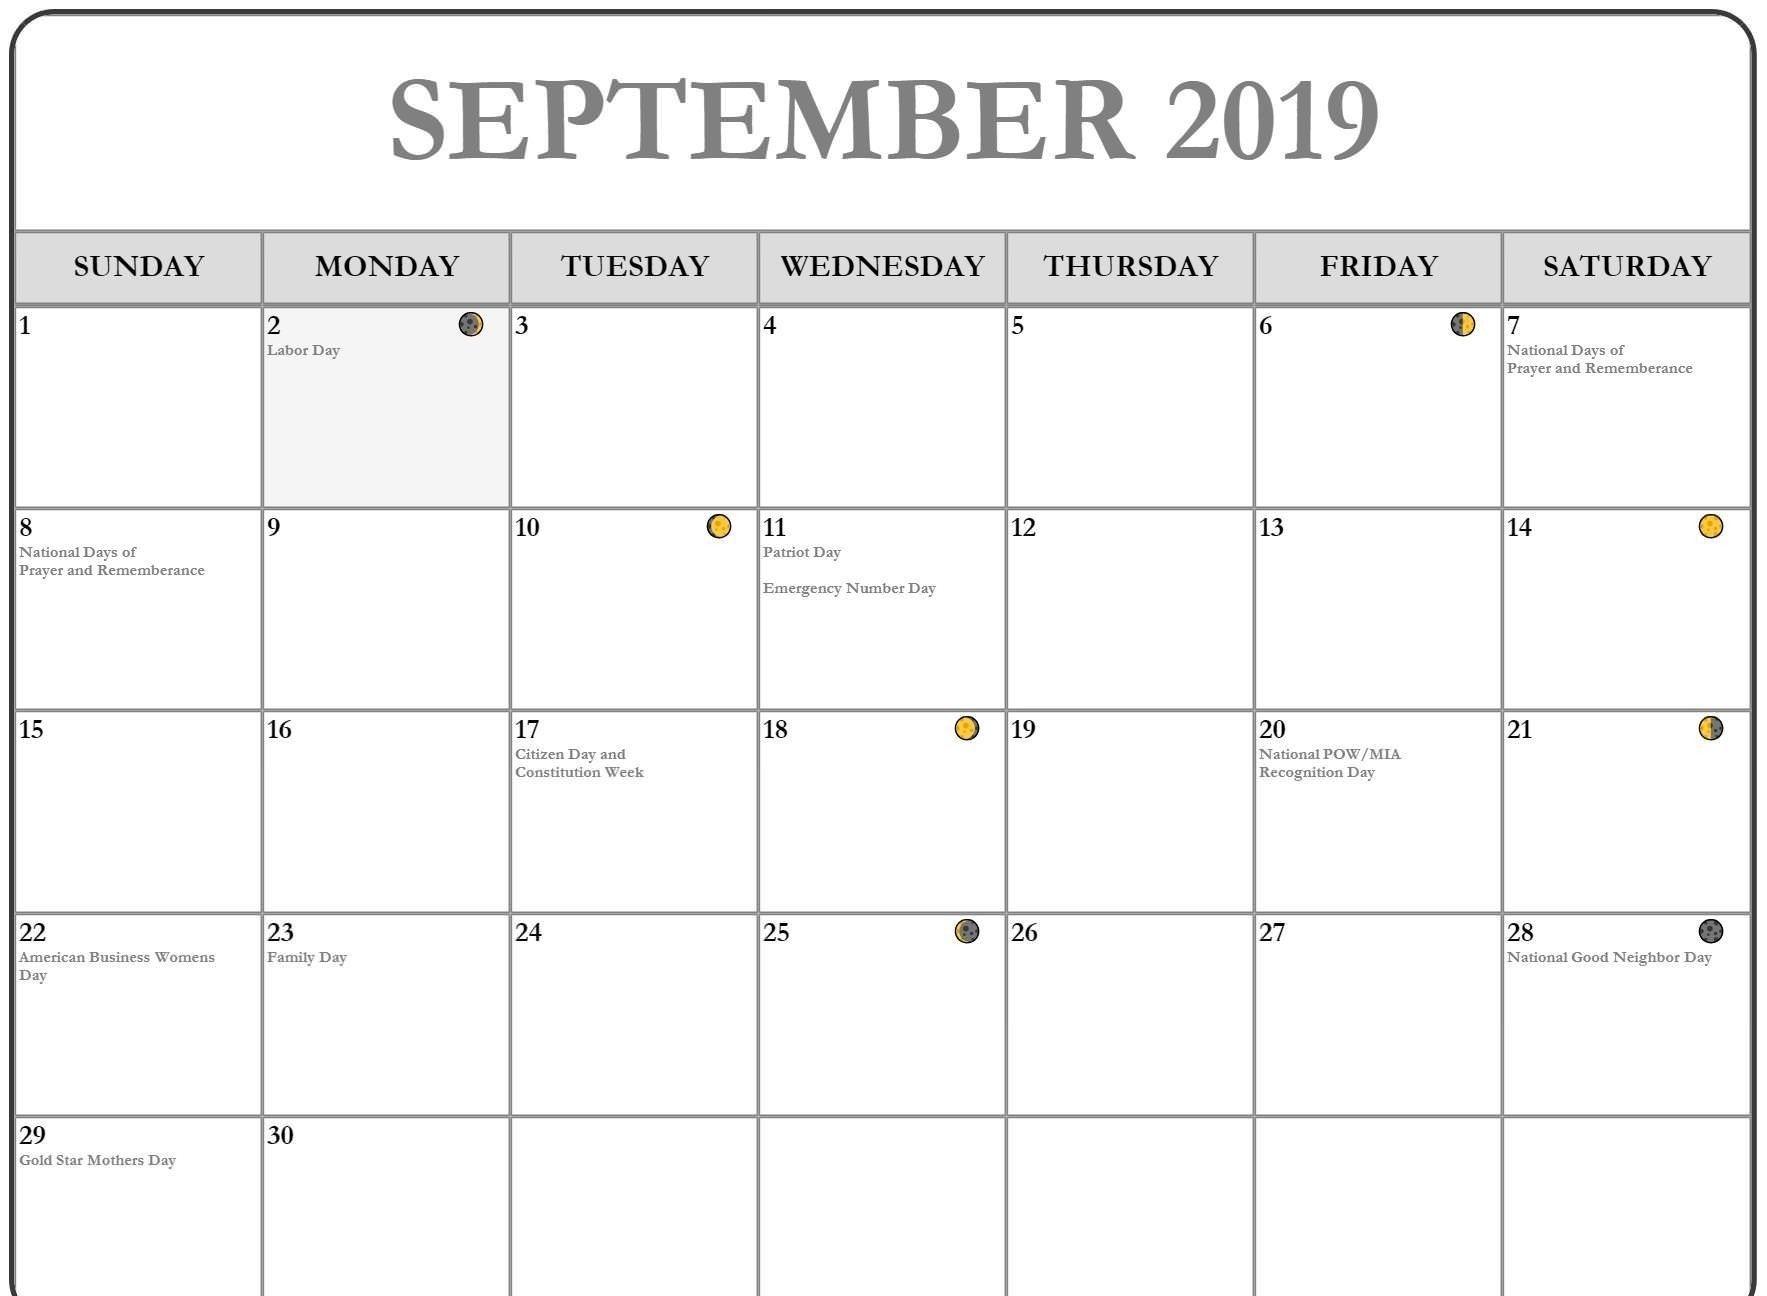 2019 September Moon Phases Calendar | Free Printable